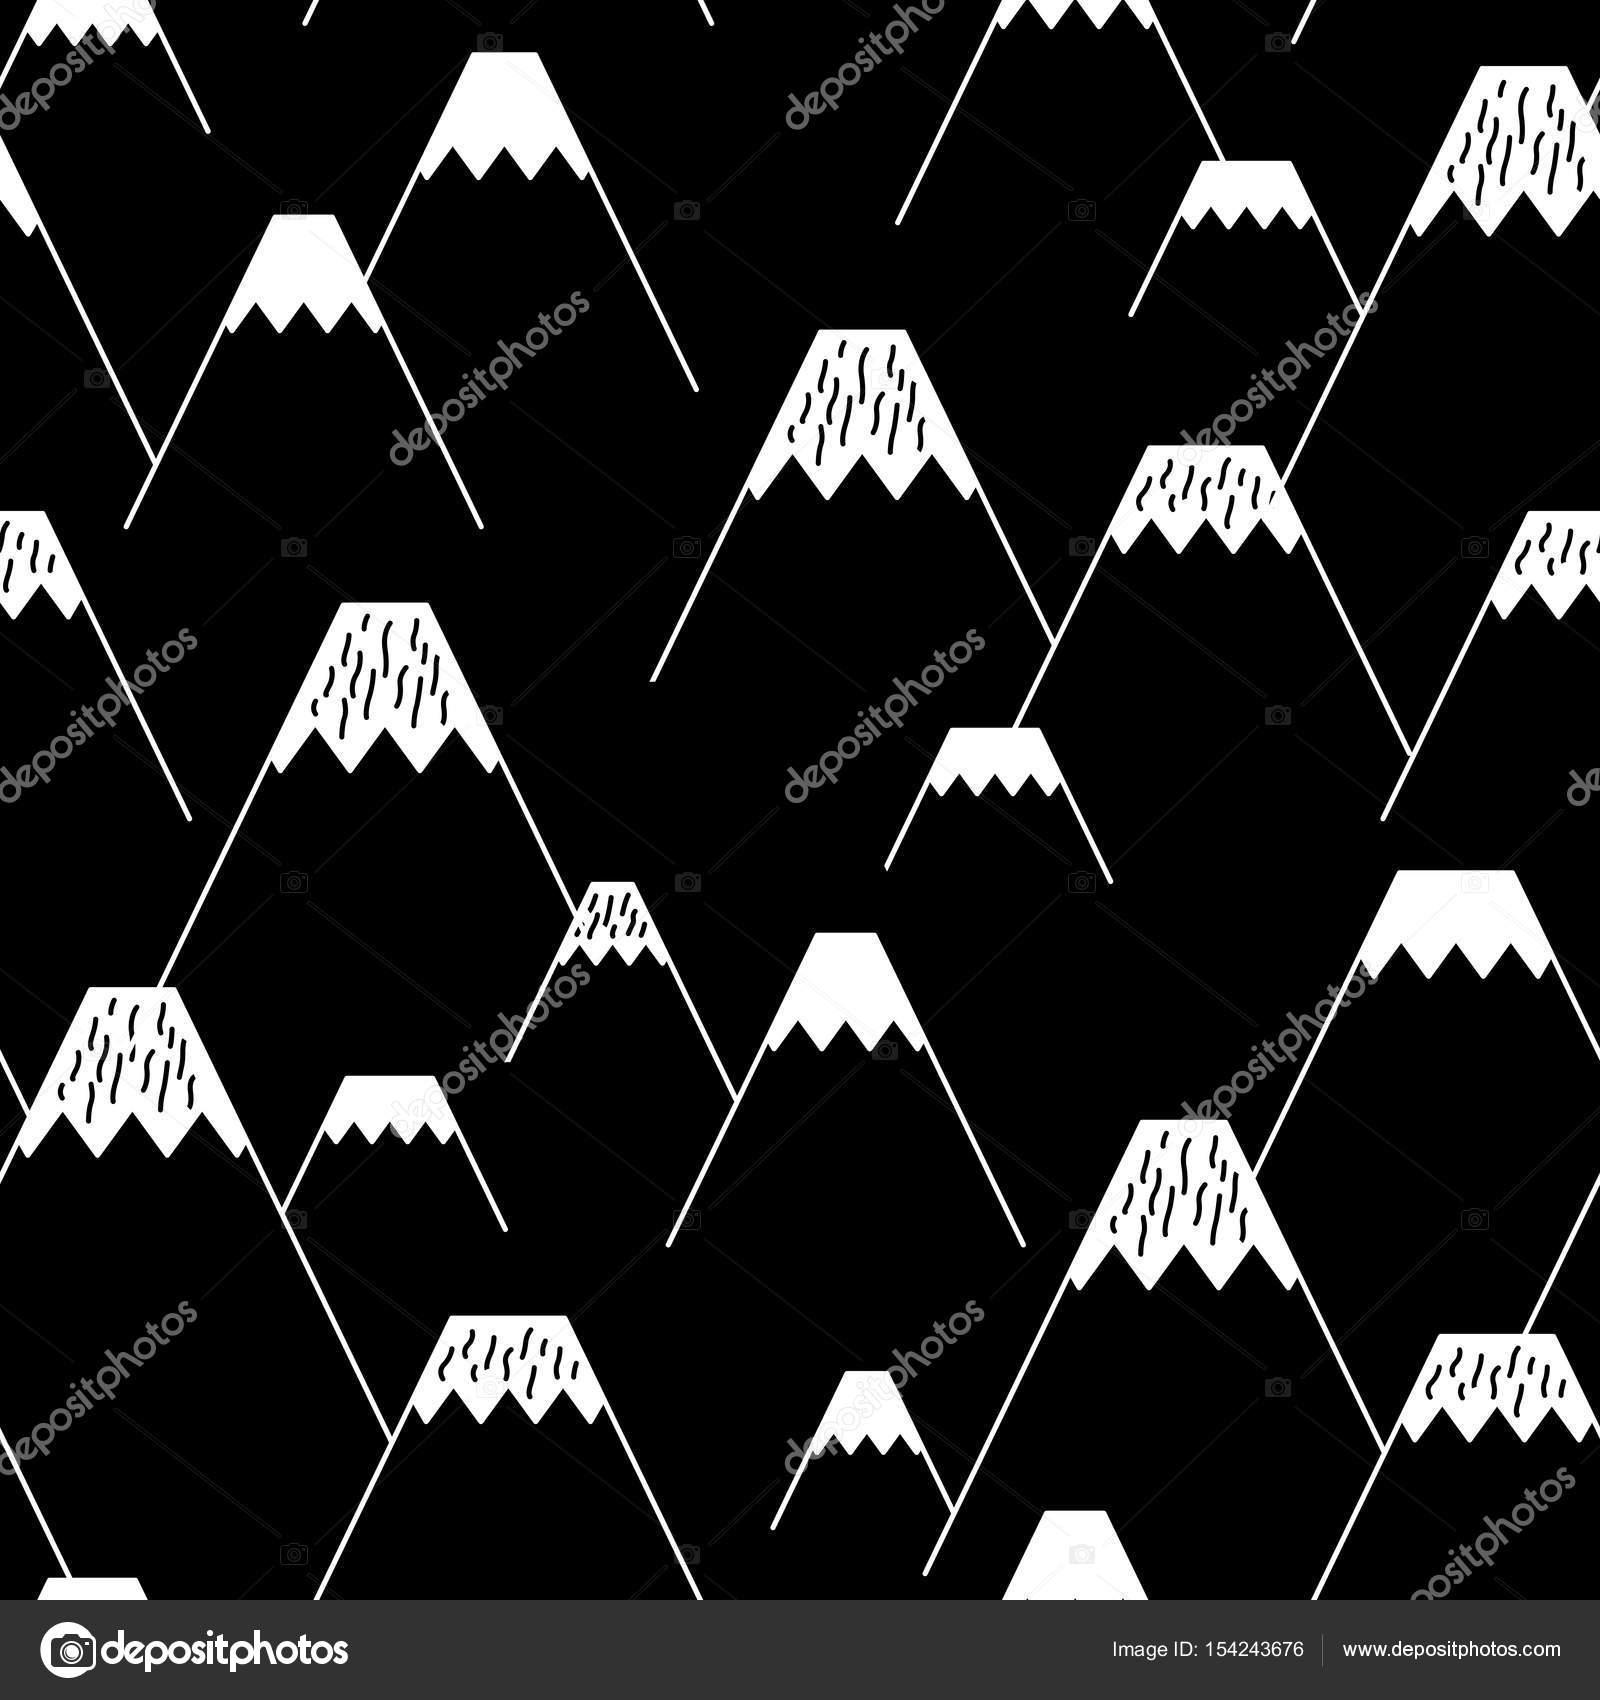 Popular Wallpaper Mountain Pattern - depositphotos_154243676-stock-illustration-mountain-vector-seamless-pattern-black  Best Photo Reference_273810.jpg